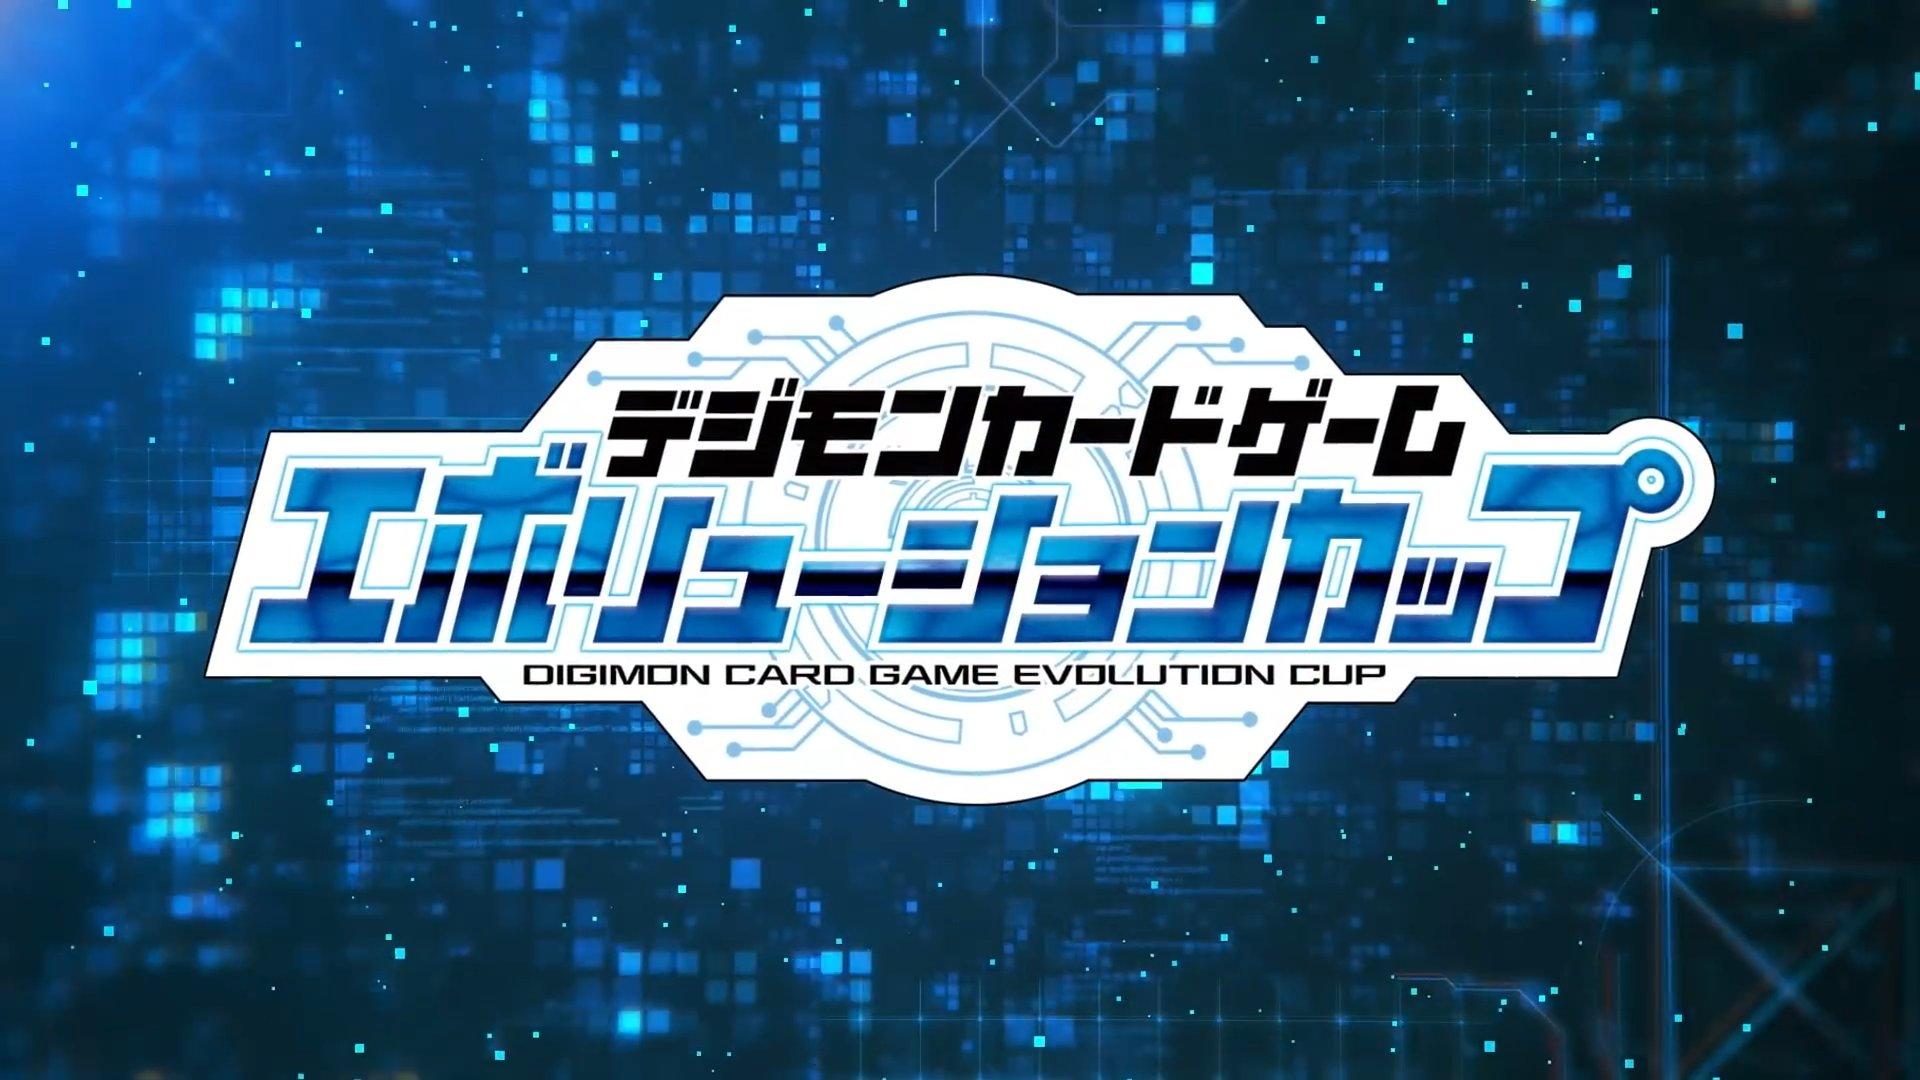 cardgameevent_03_july23_2020.jpg